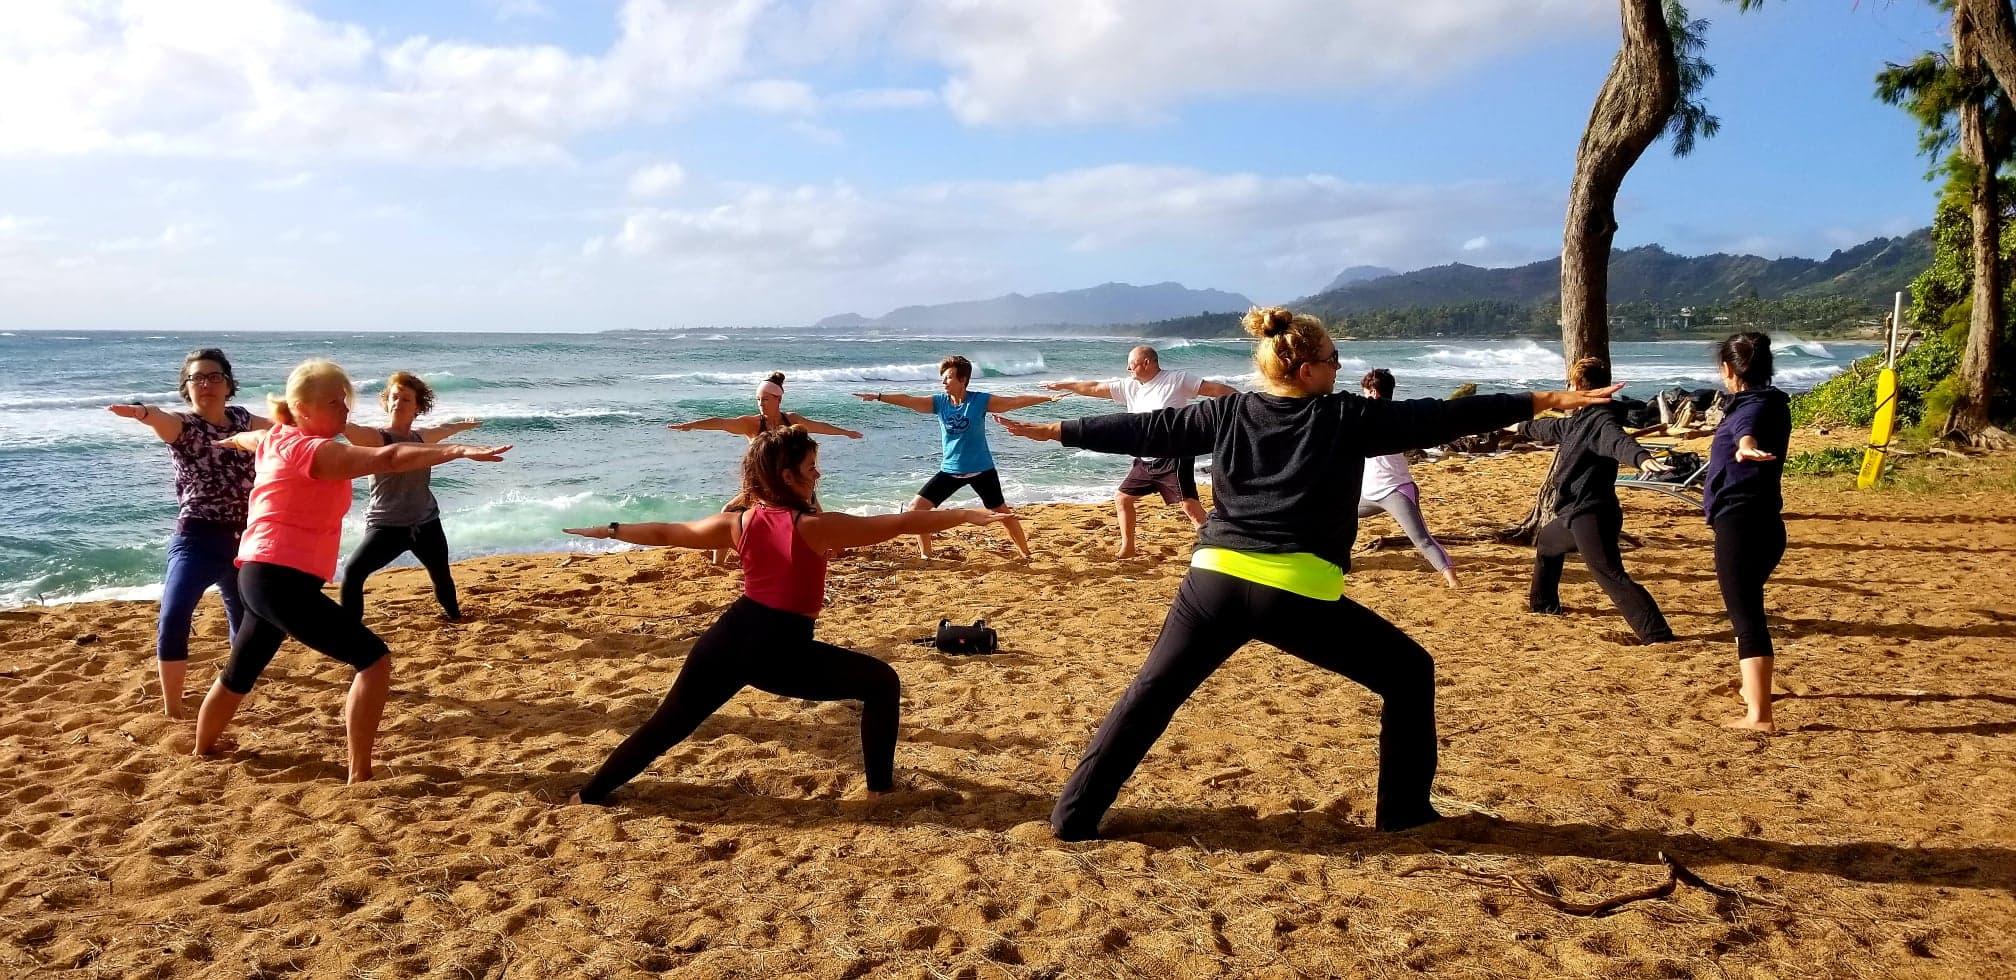 Kauai Yoga on the Beach - 420 Papaloa Rd, Kapaa, HI 96746On the beachfront of Kauai Shores Resort aside Lava Lava Beach Club   EVERYDAY @ 8:30-9:45amSAMSATI's Hatha Flow   Wednesday & Saturday$20 cash in person   $10 kamaʻāina